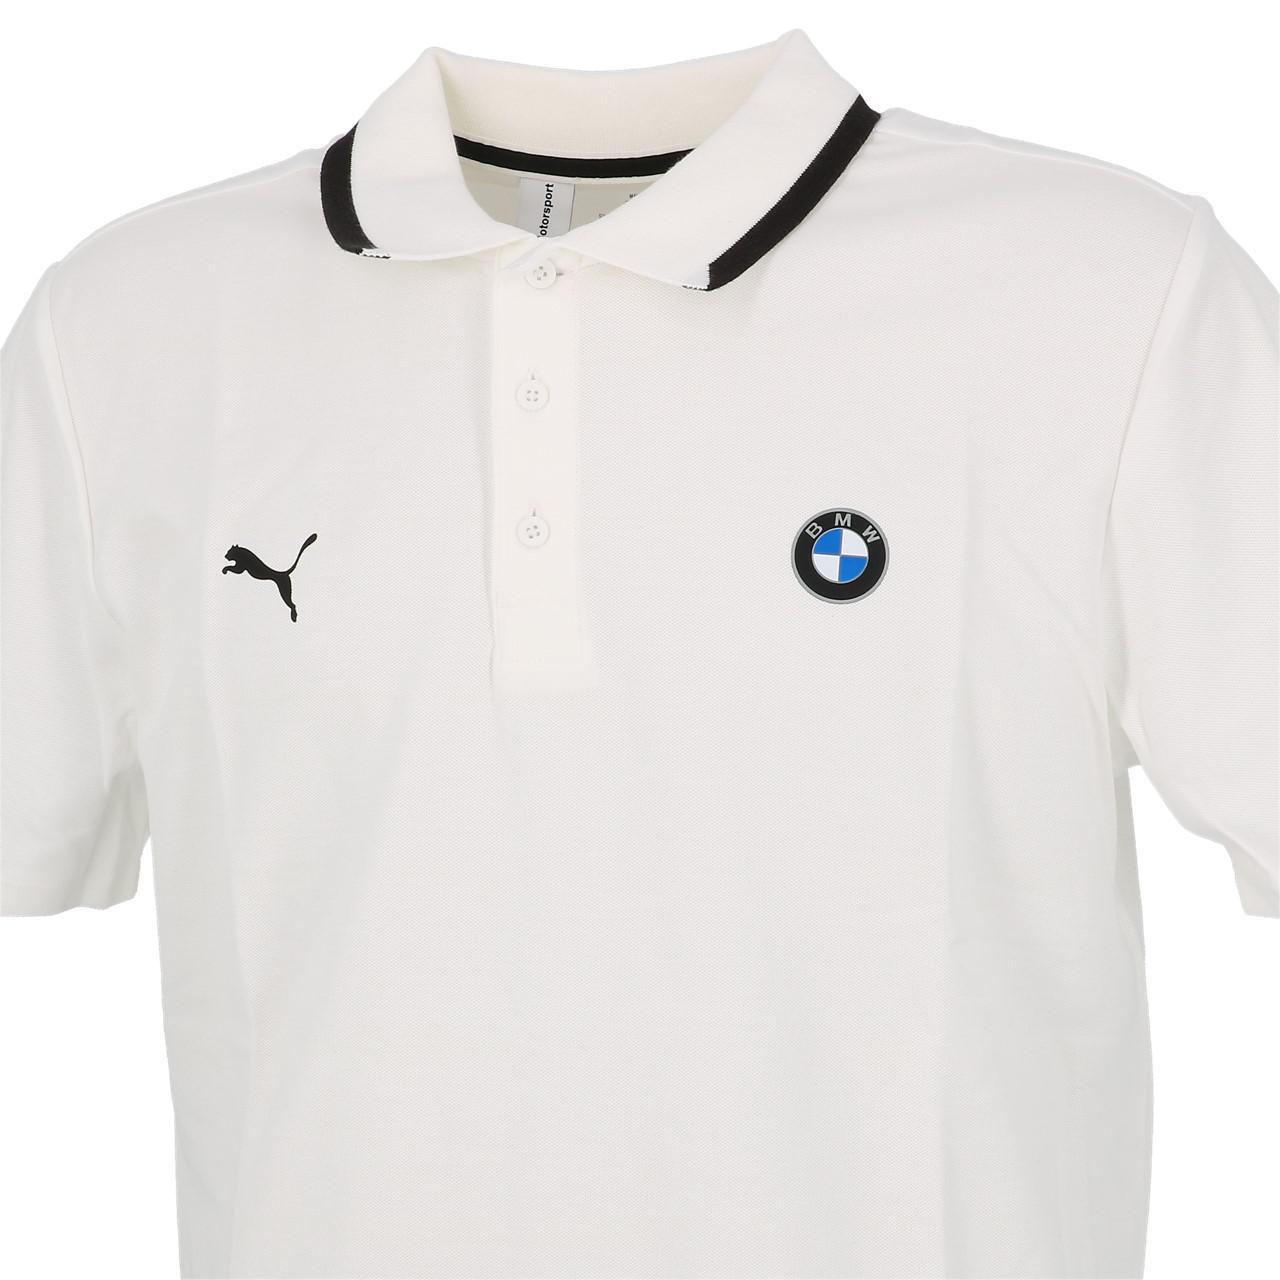 Short-Sleeve-Polo-Puma-BMW-Mms-Wht-Mc-Polo-White-30113-New thumbnail 2